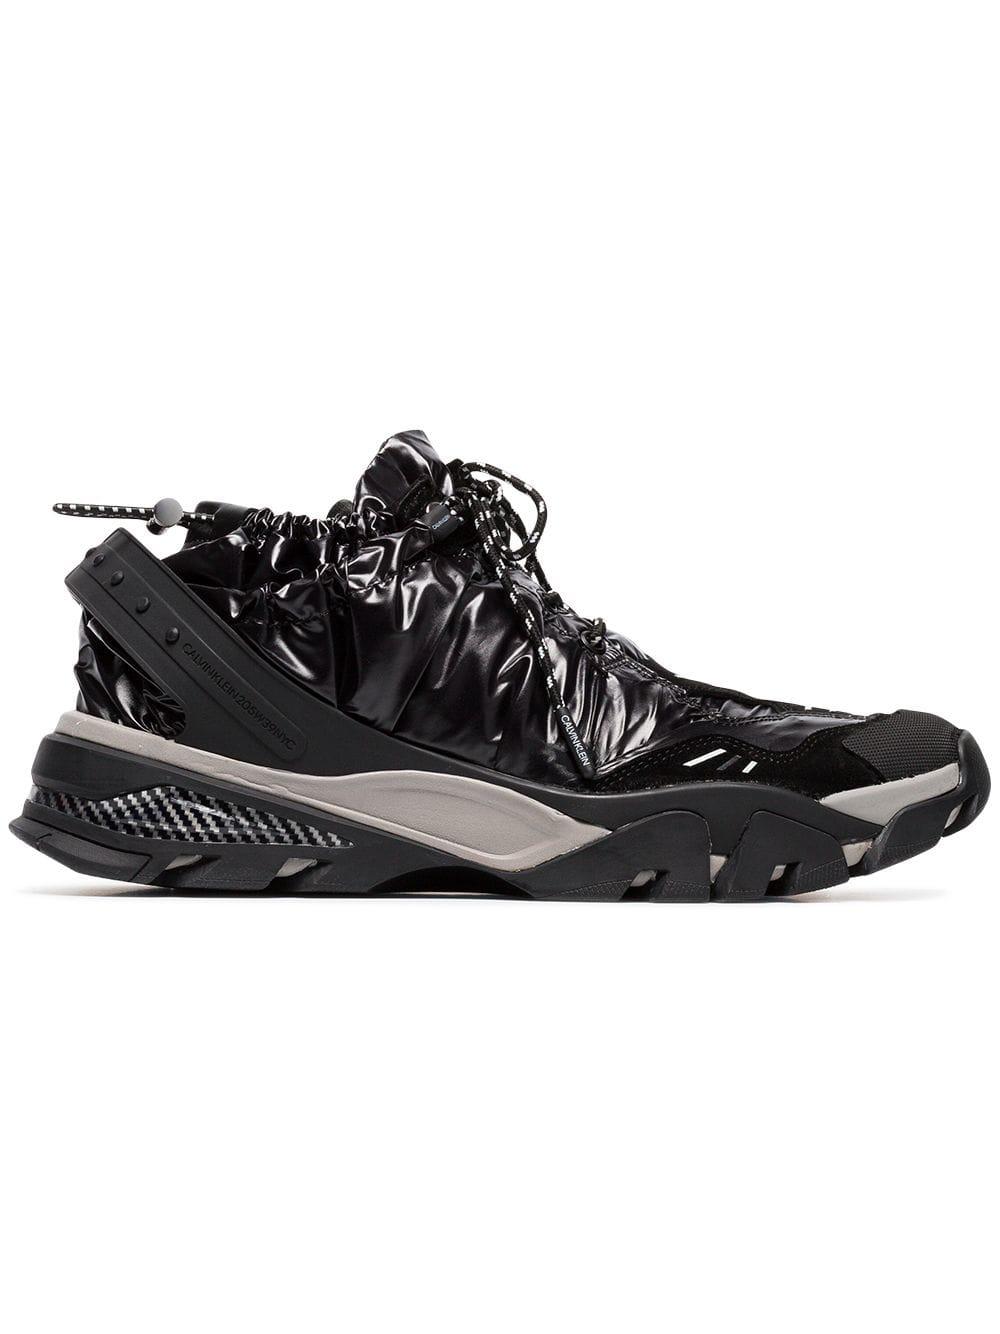 Calvin Klein Black Nylon Carsdat Sneakers